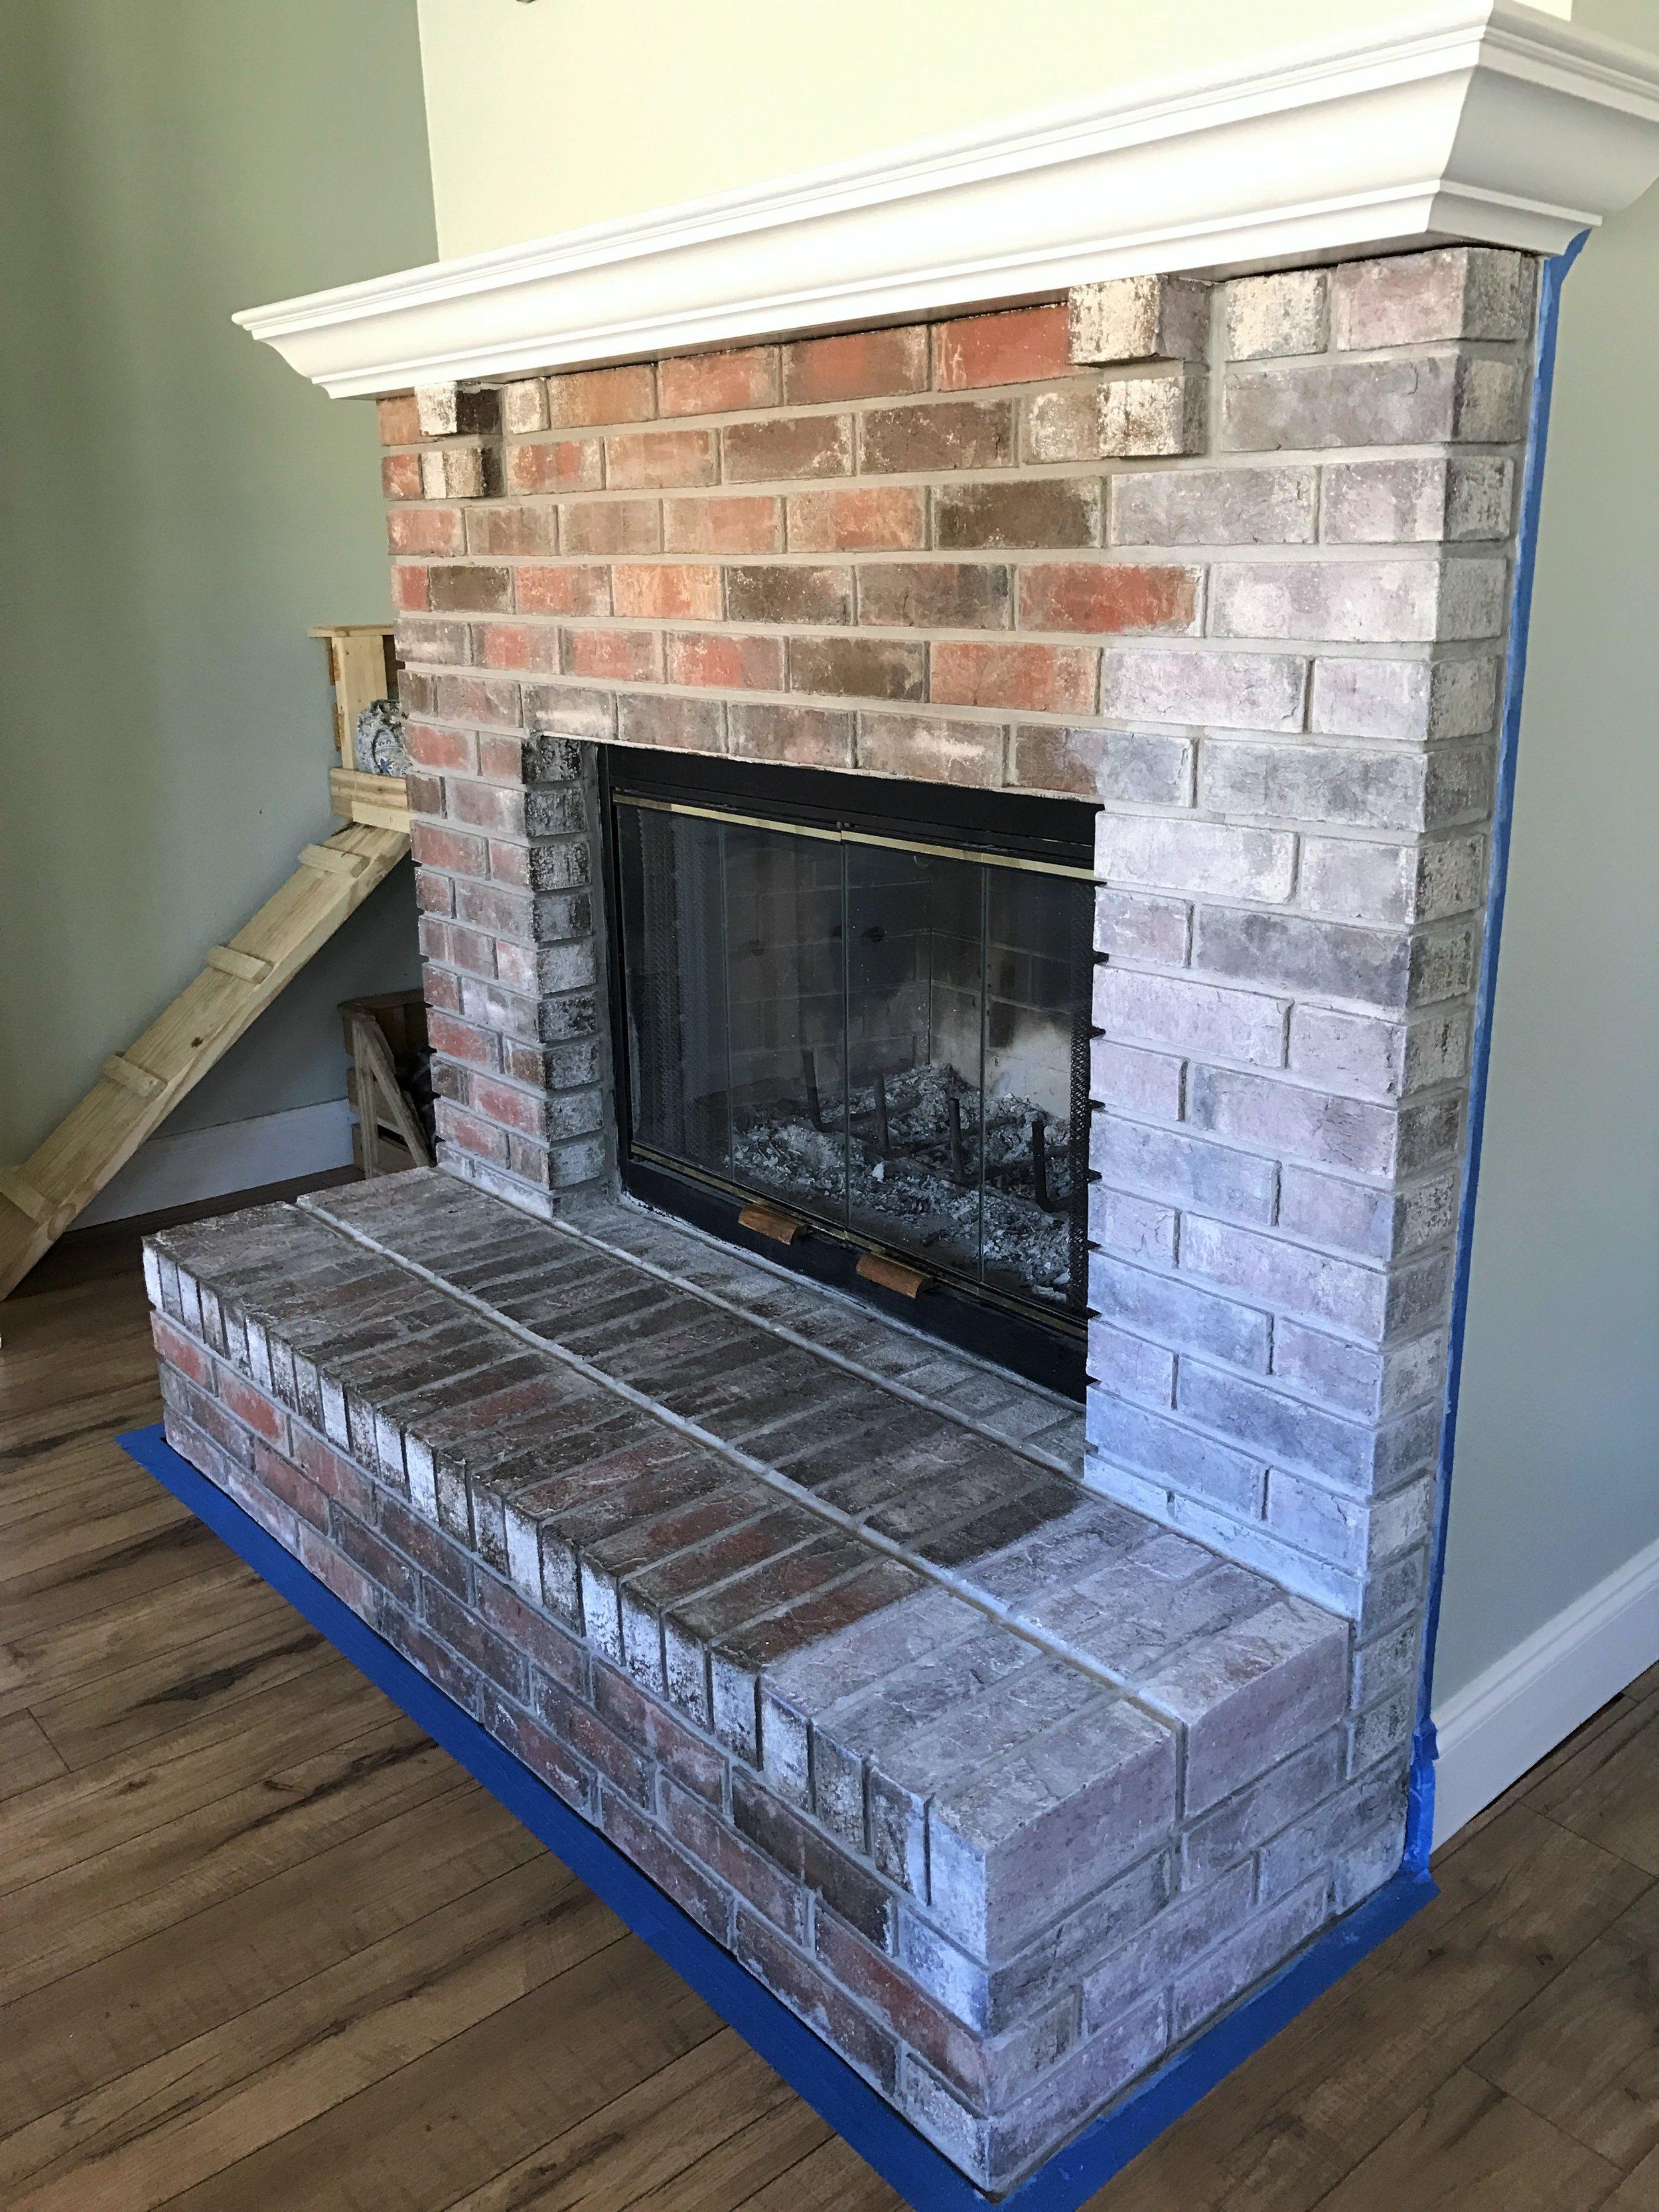 How to Whitewash a Brick Fireplace | This Hiatus